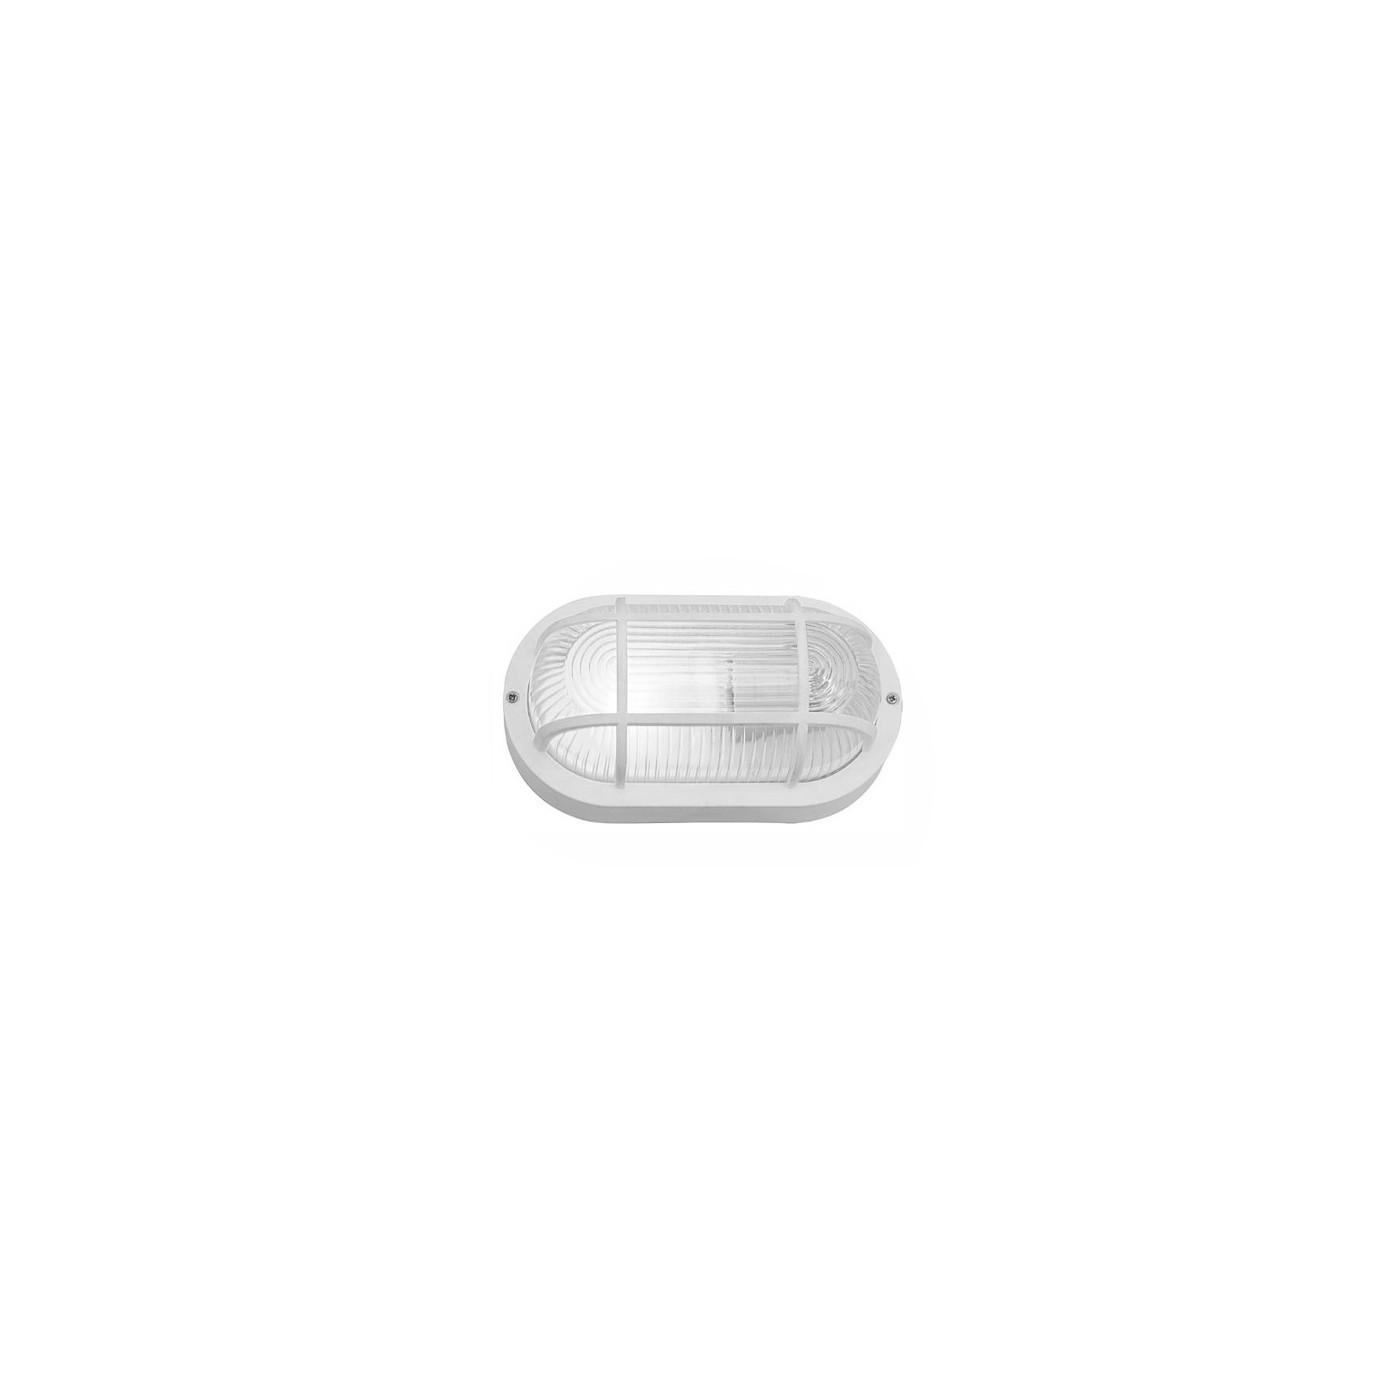 Lámpara Bullseye (Bulleye), blanca E27, aspecto industrial, resistente al agua  - 1